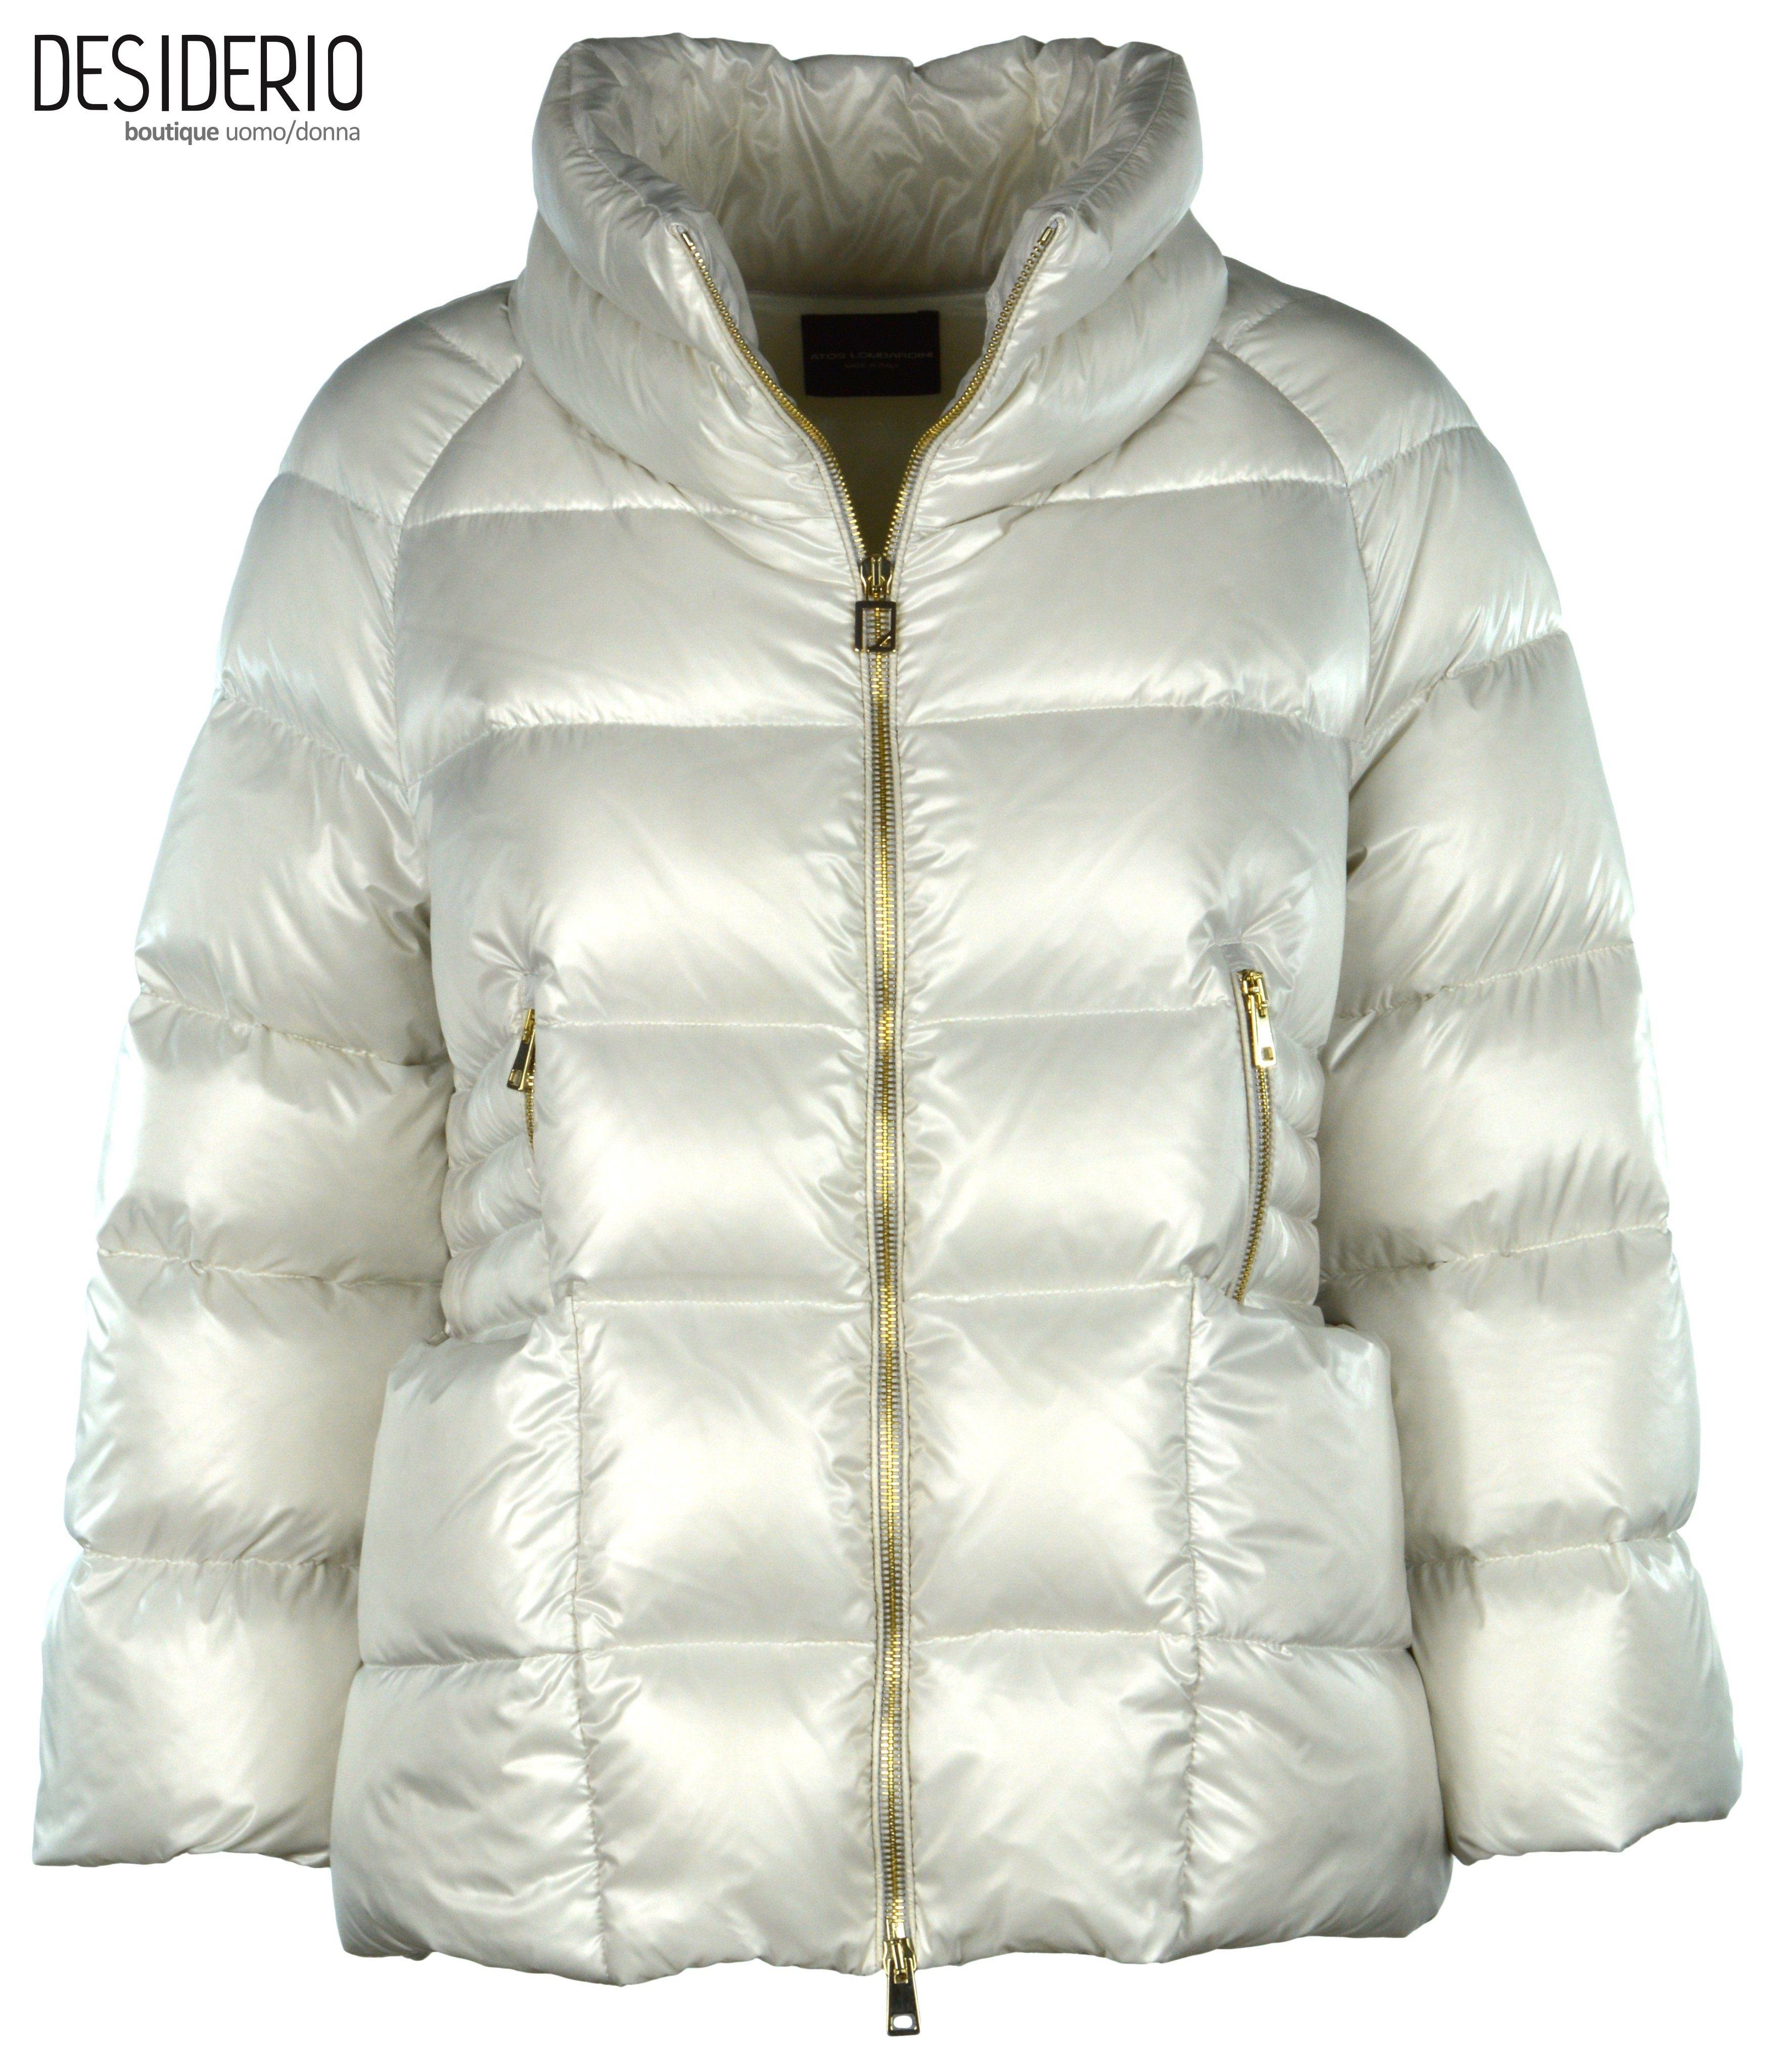 Atos Lombardini Desiderio Shop Piumino Boutique Bianco Online rrdqwAxFf 44dce392530